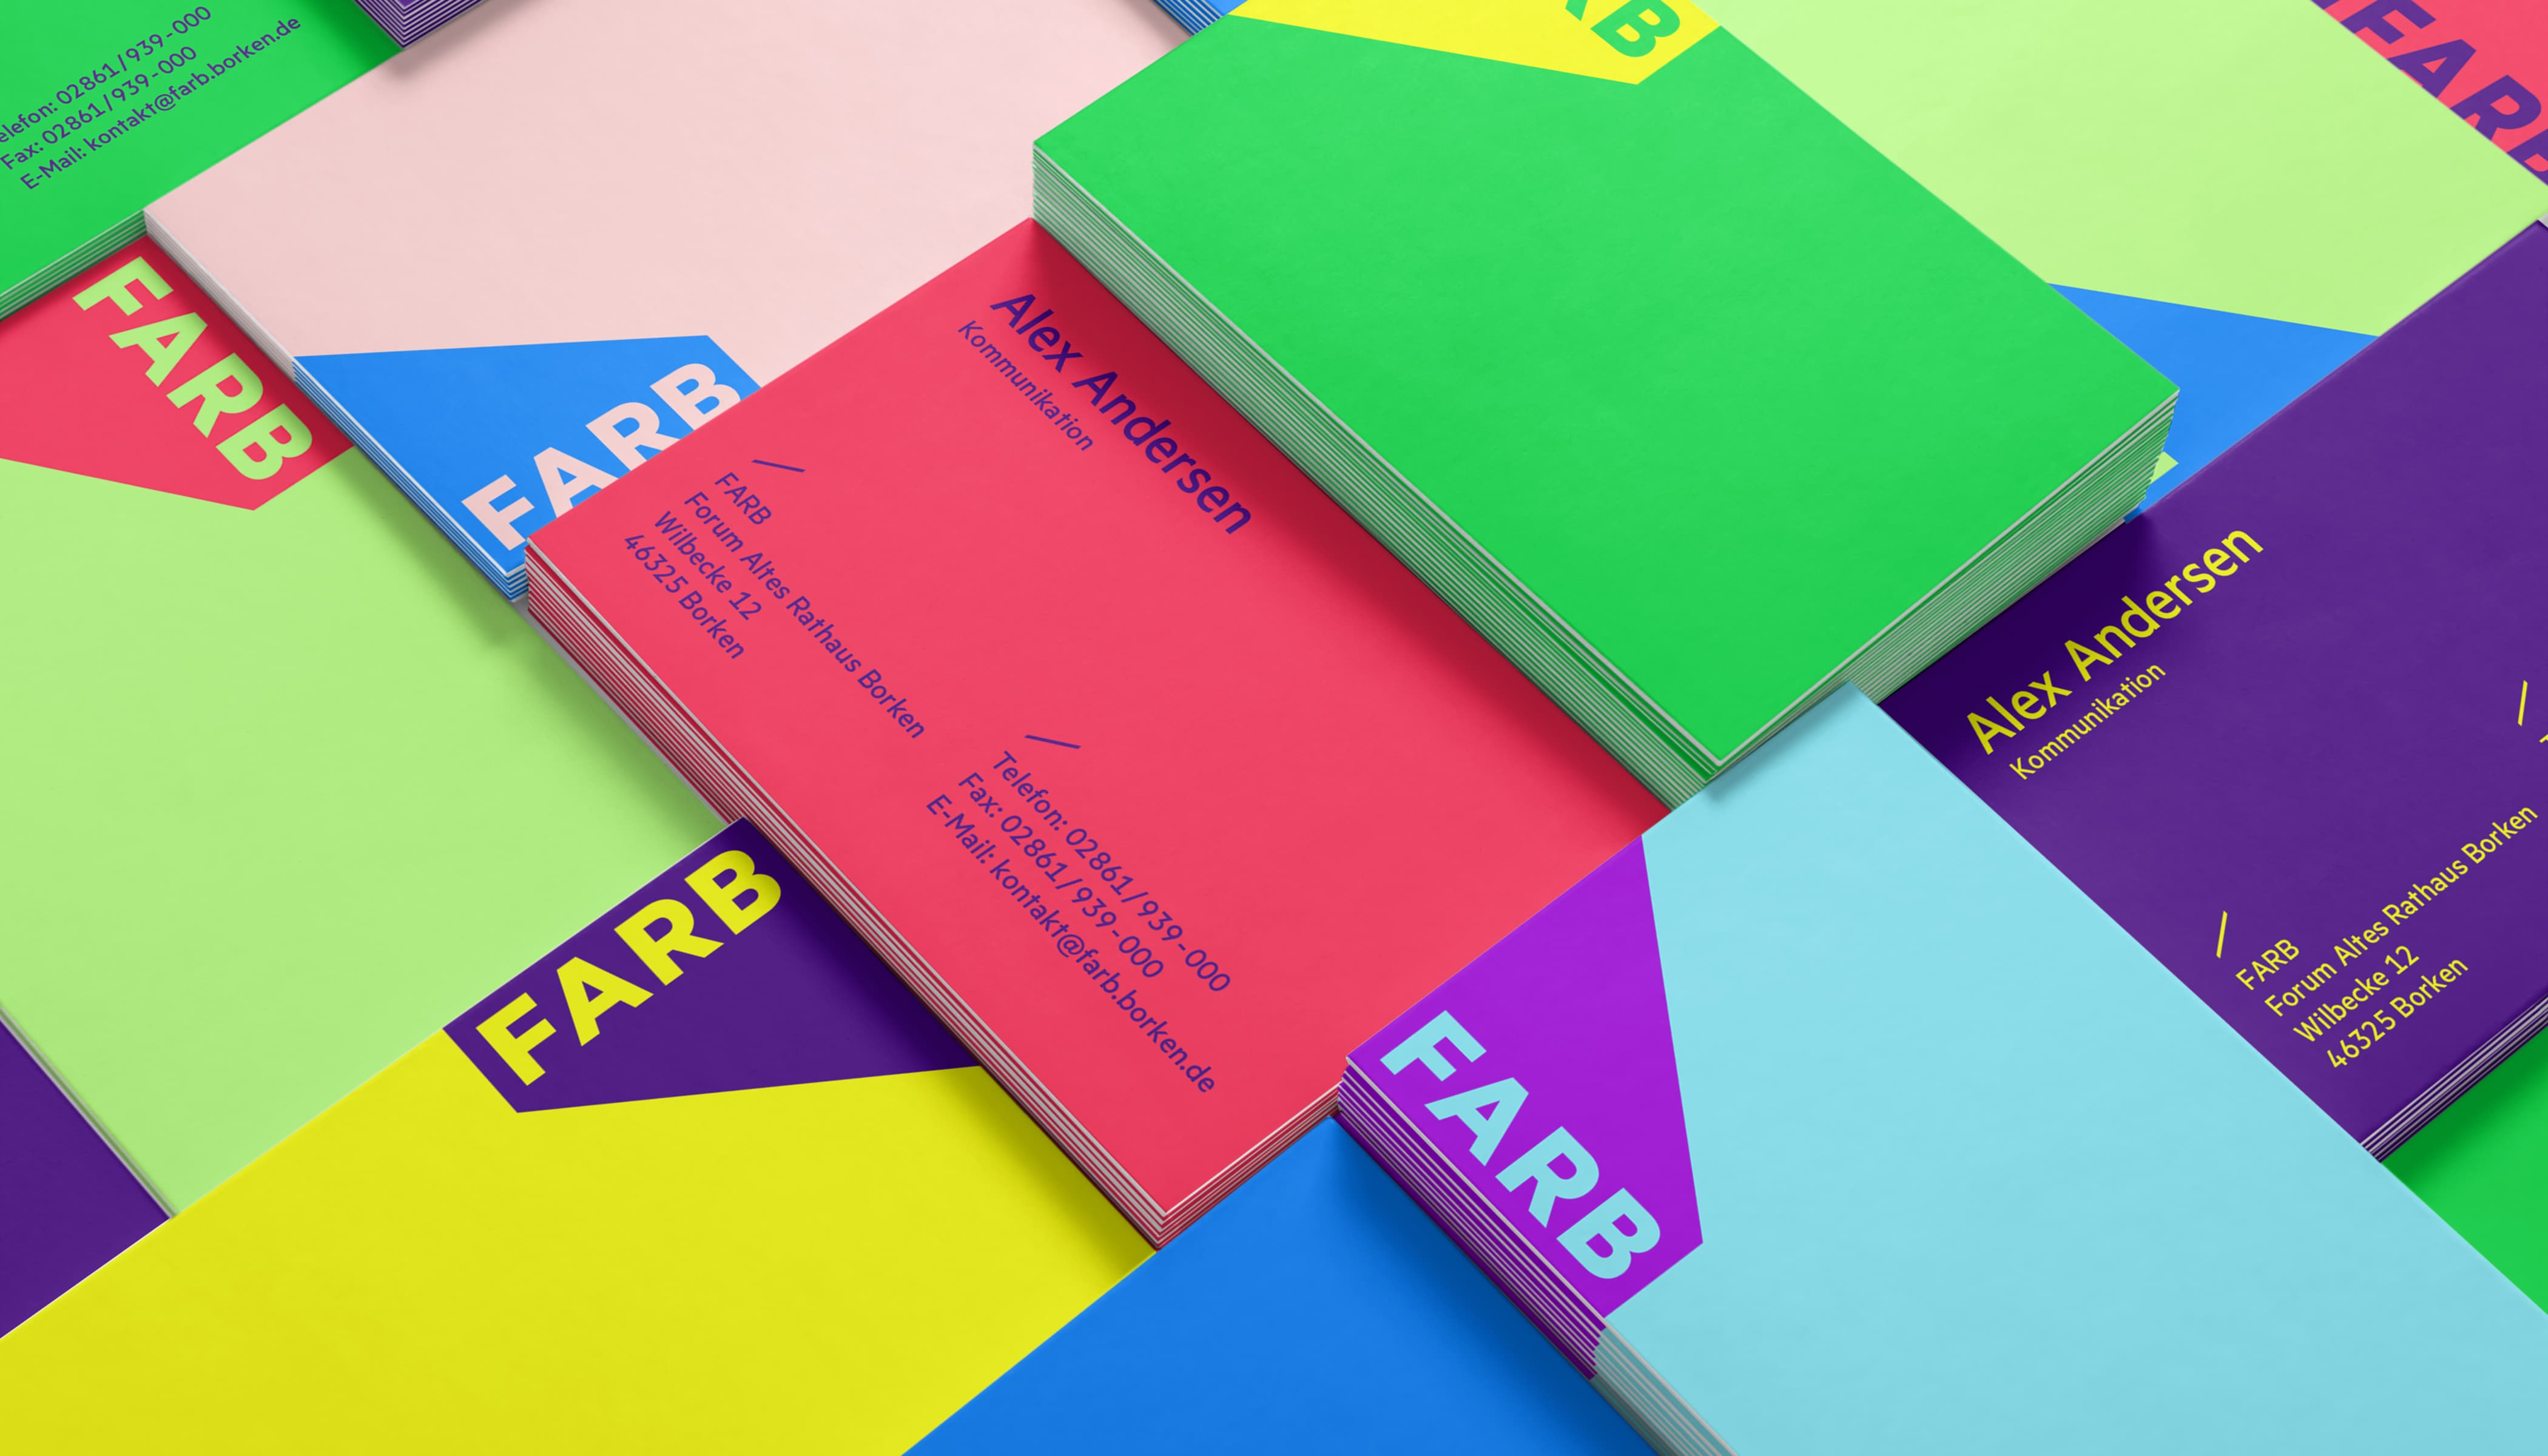 FARB CD Visitenkarten